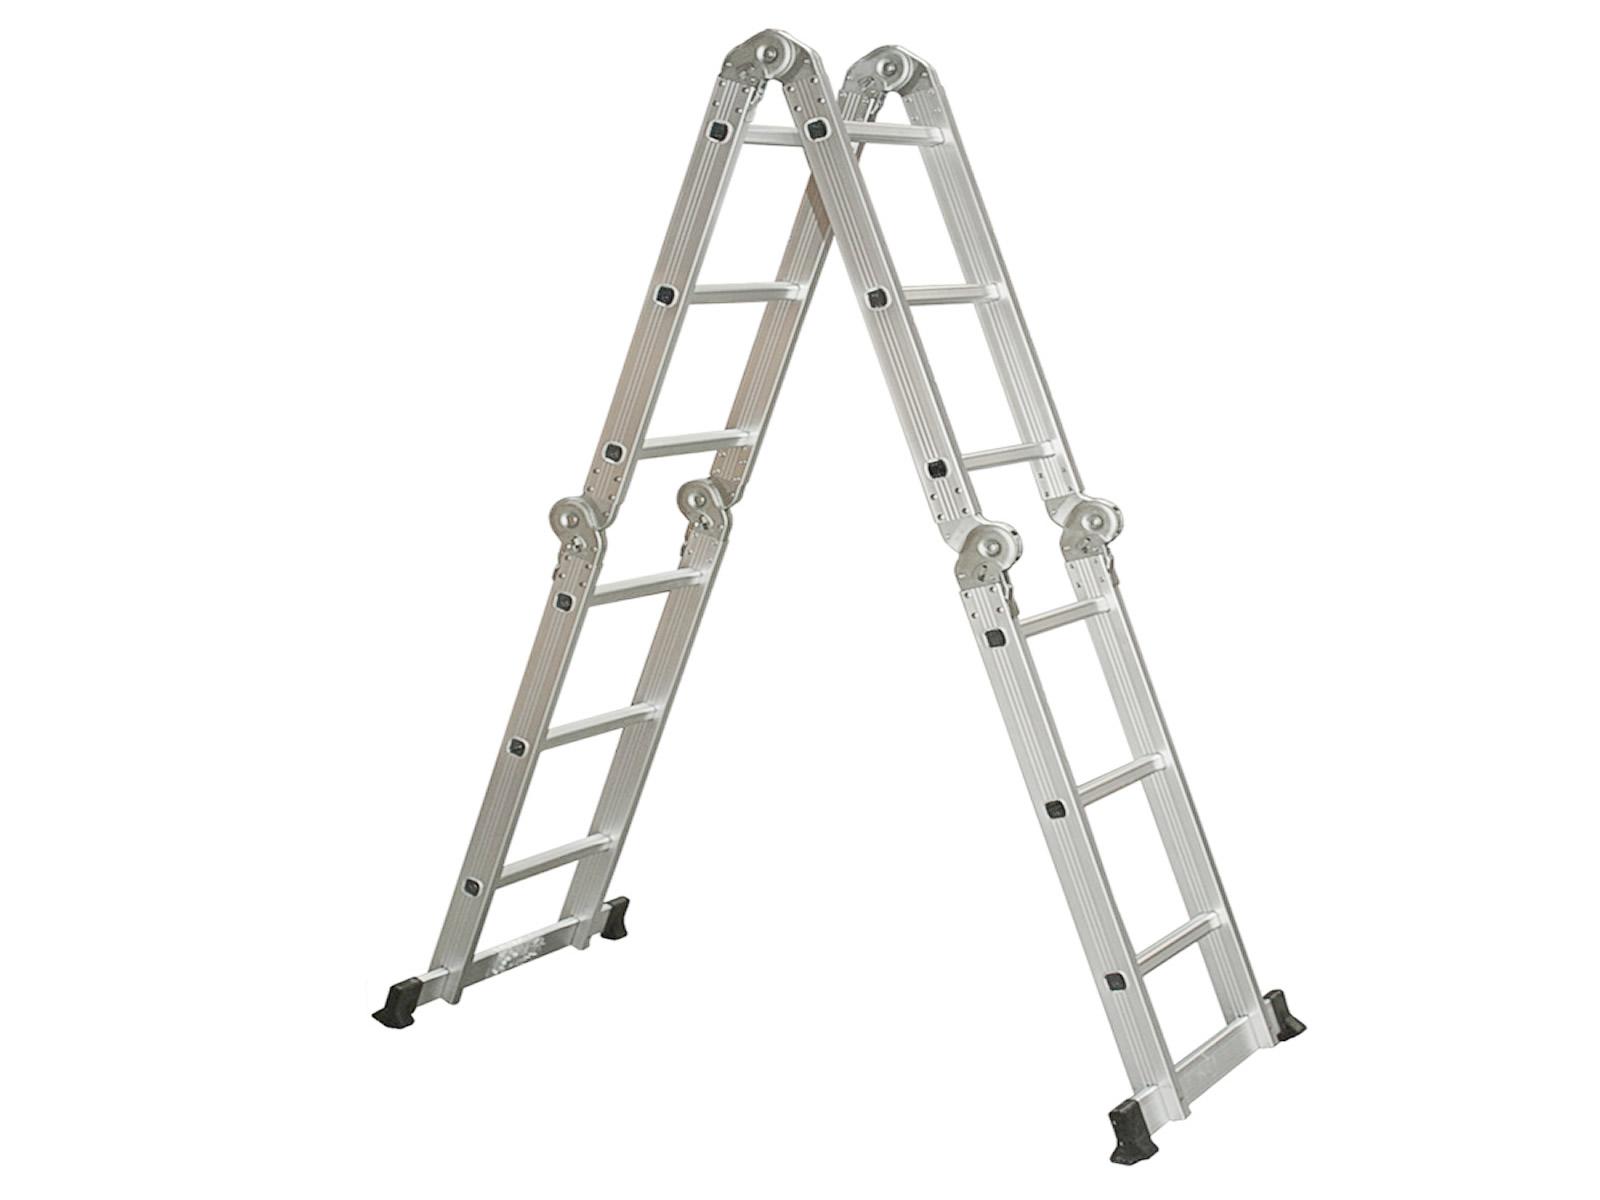 Collapsible Ladder 8 : Folding ladder aluminum ft multi purpose extension